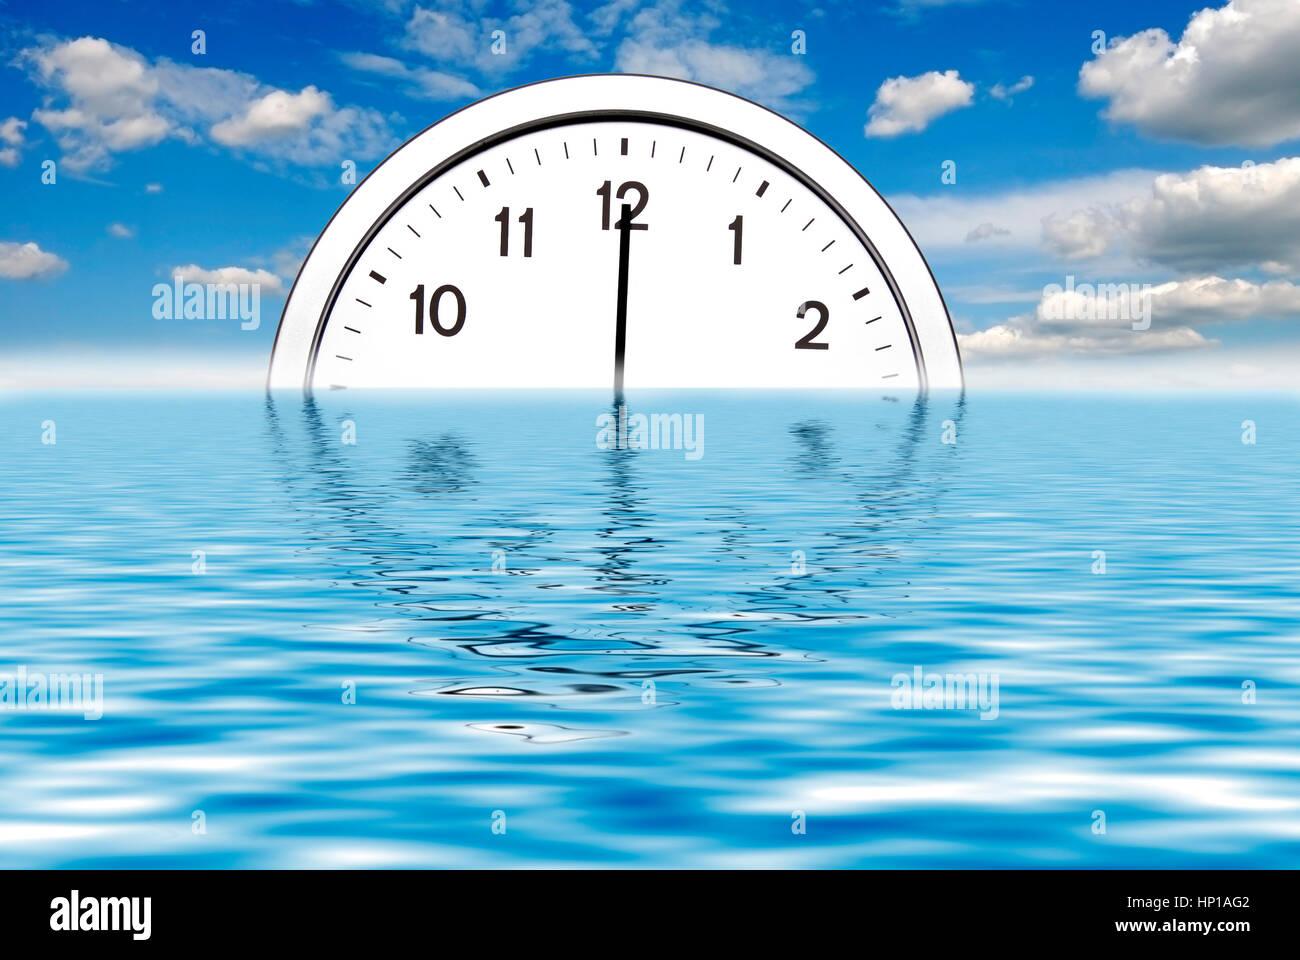 clock at twelve o'clock rising on the horizon of the ocean - Stock Image